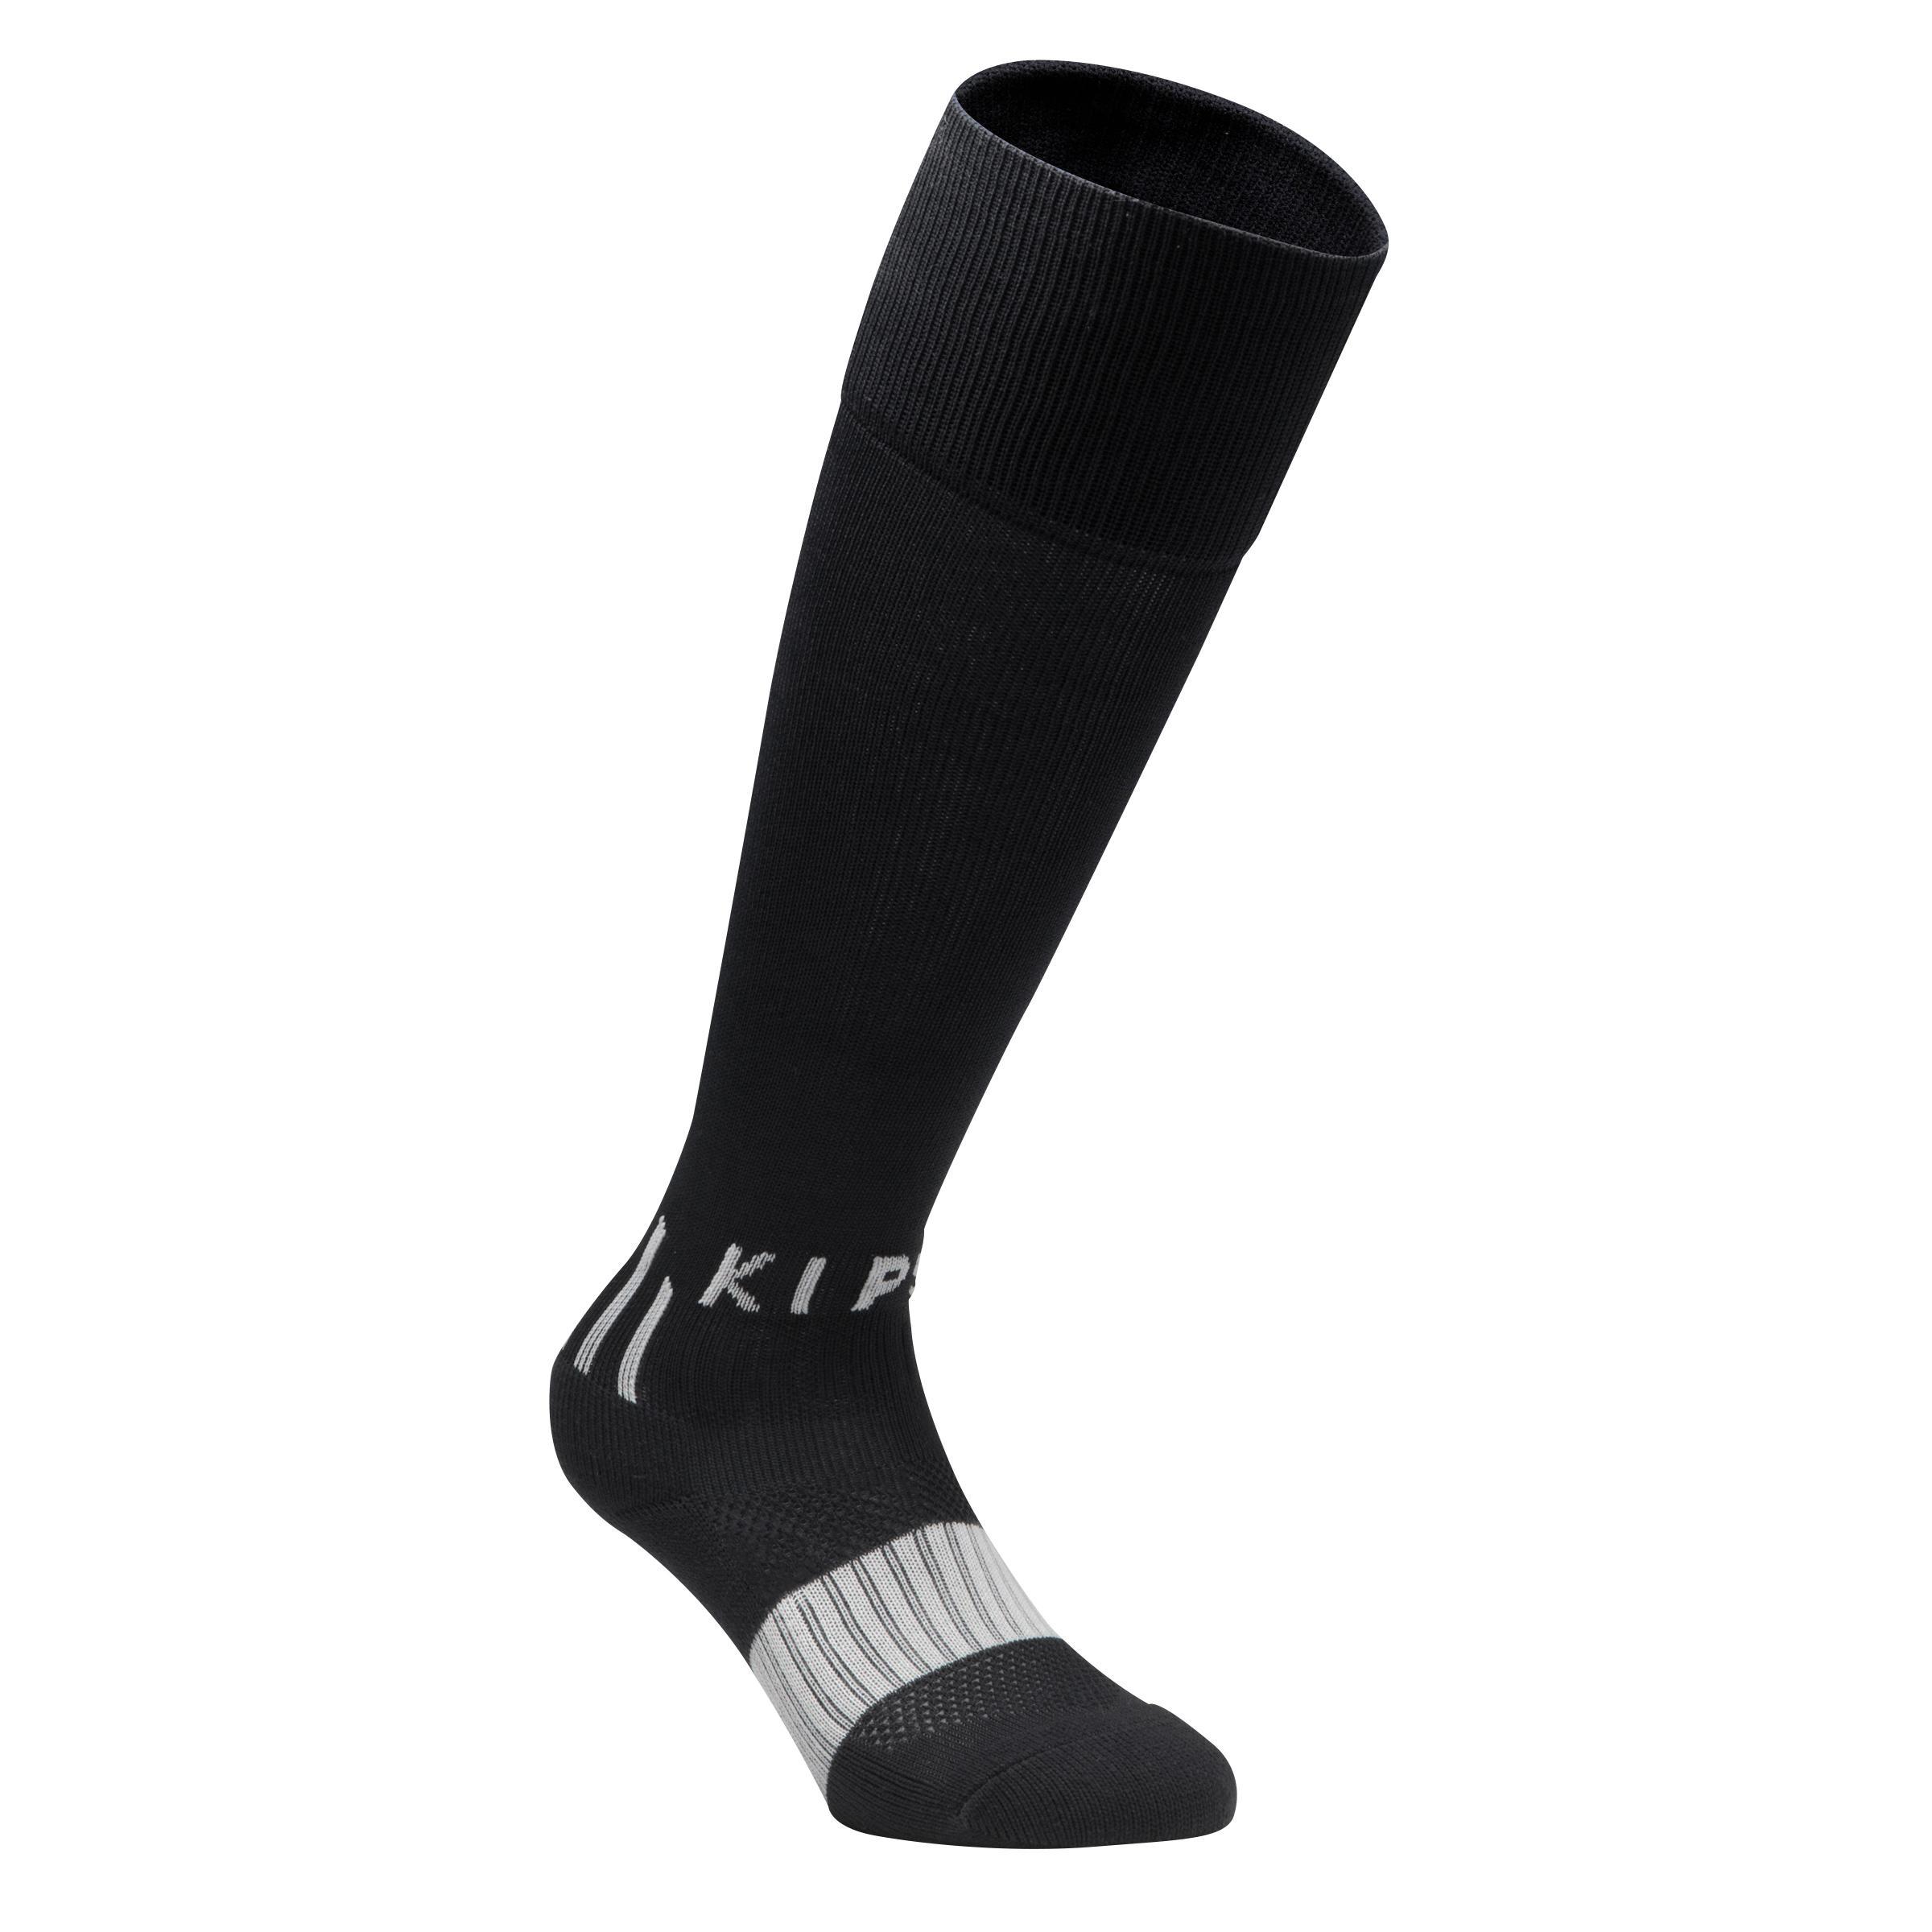 F 500 Kaos Kaki Sepak bola Junior - Hitam Sepanjang Lutut